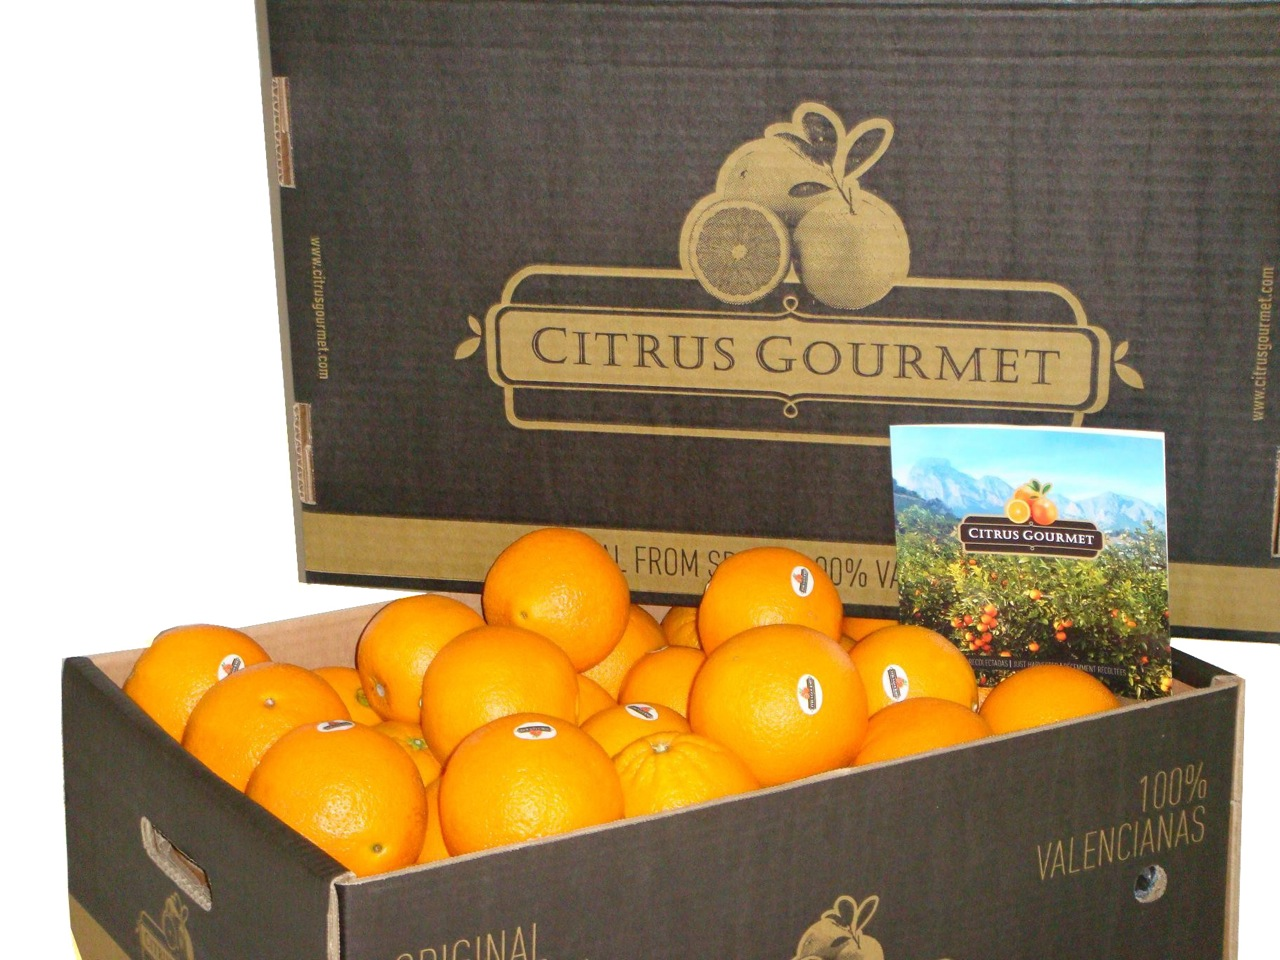 Apfelsinen aus Valencia von CitrusGourmet. Tafelapfelsinen Premium 15 kg